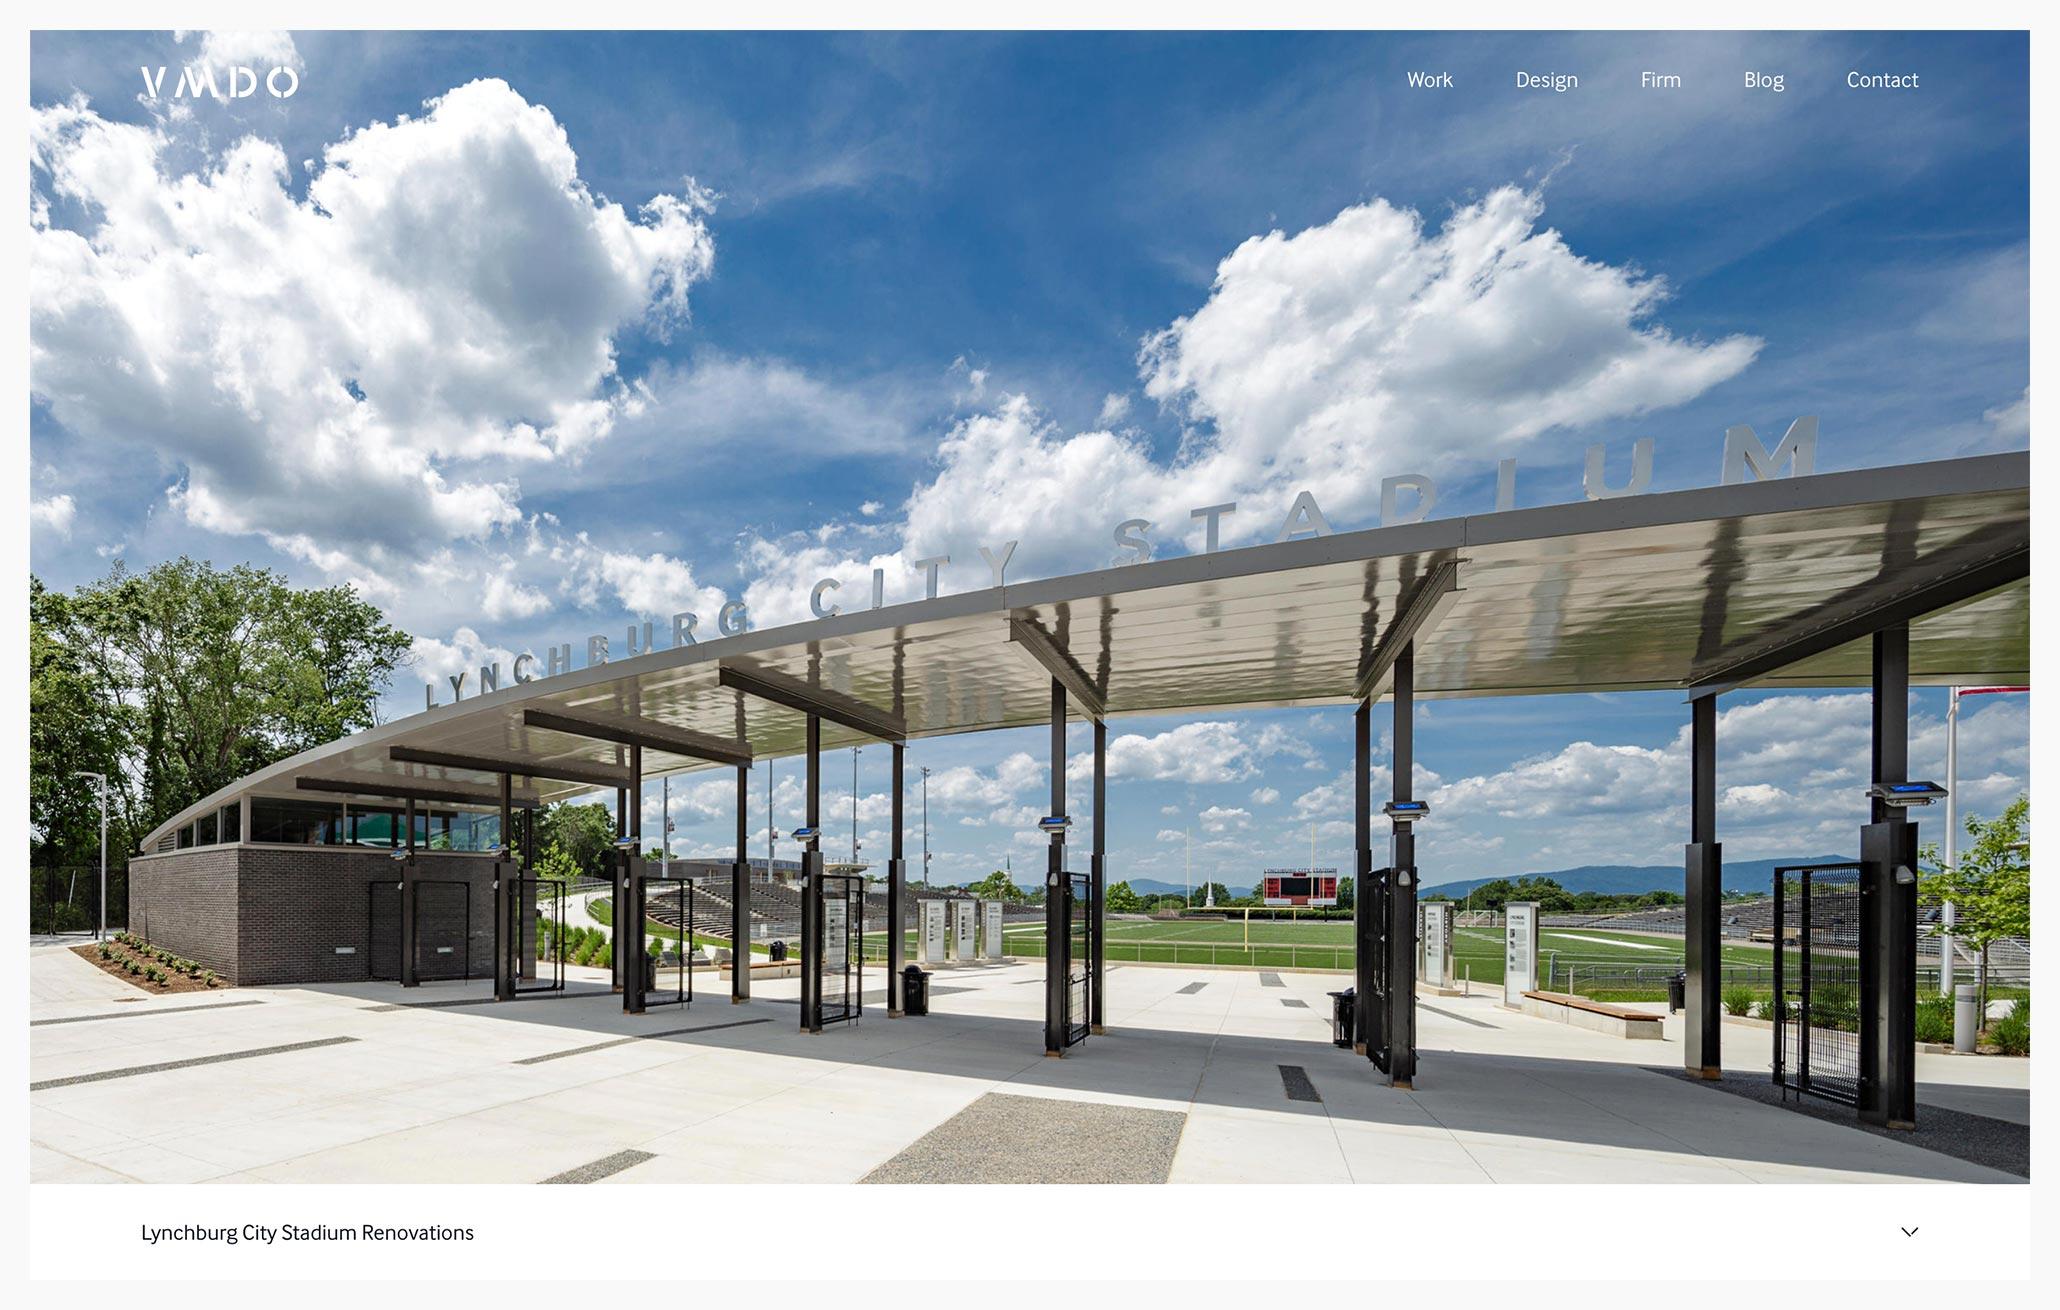 VMDO Architects - Best Architecture Website of 2019